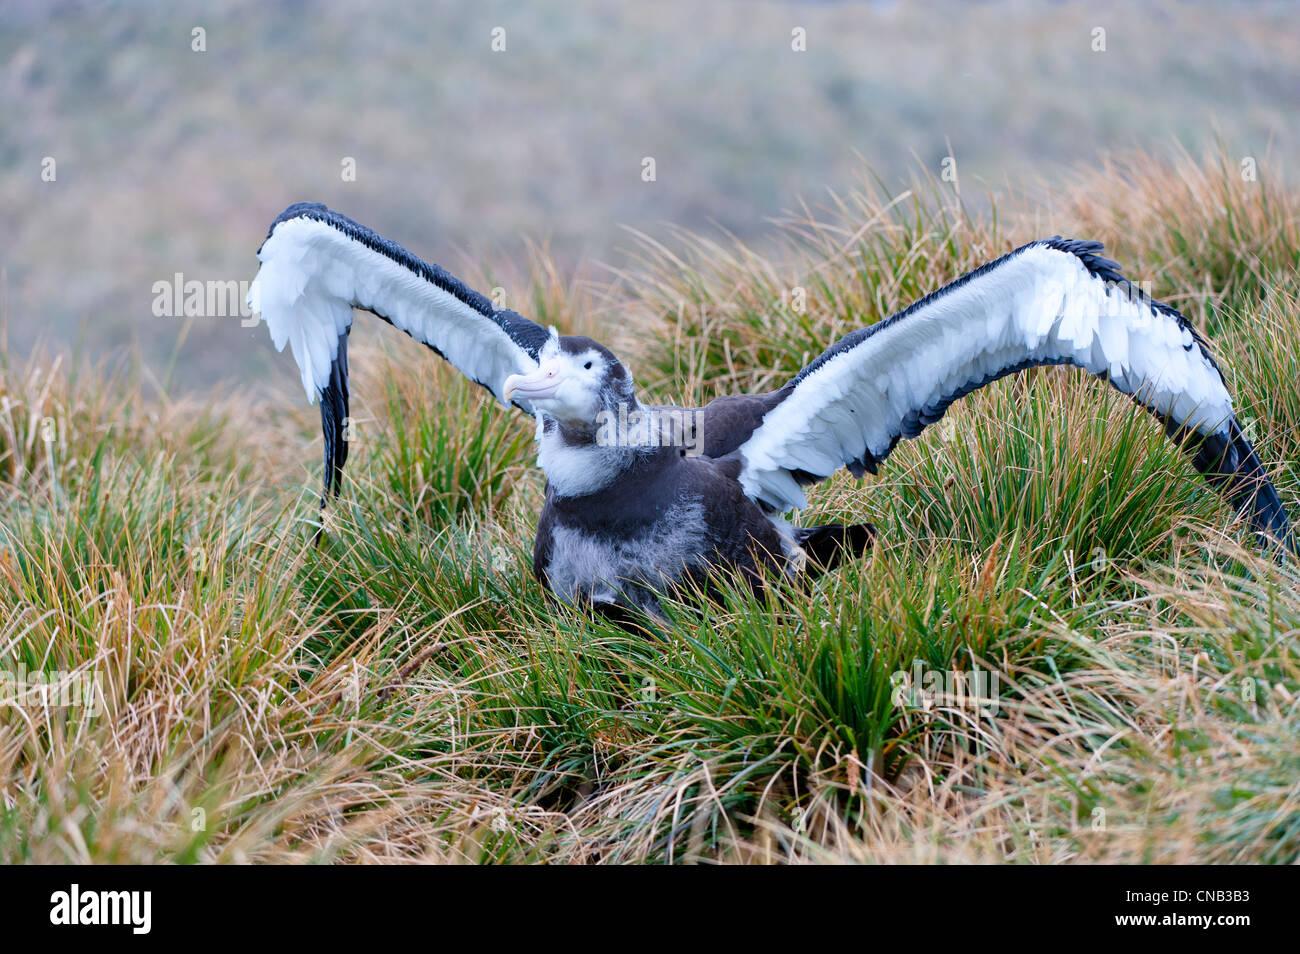 Juvenile Wandering Albatross (Diomedea exulans), Prion Island, South Georgia - Stock Image